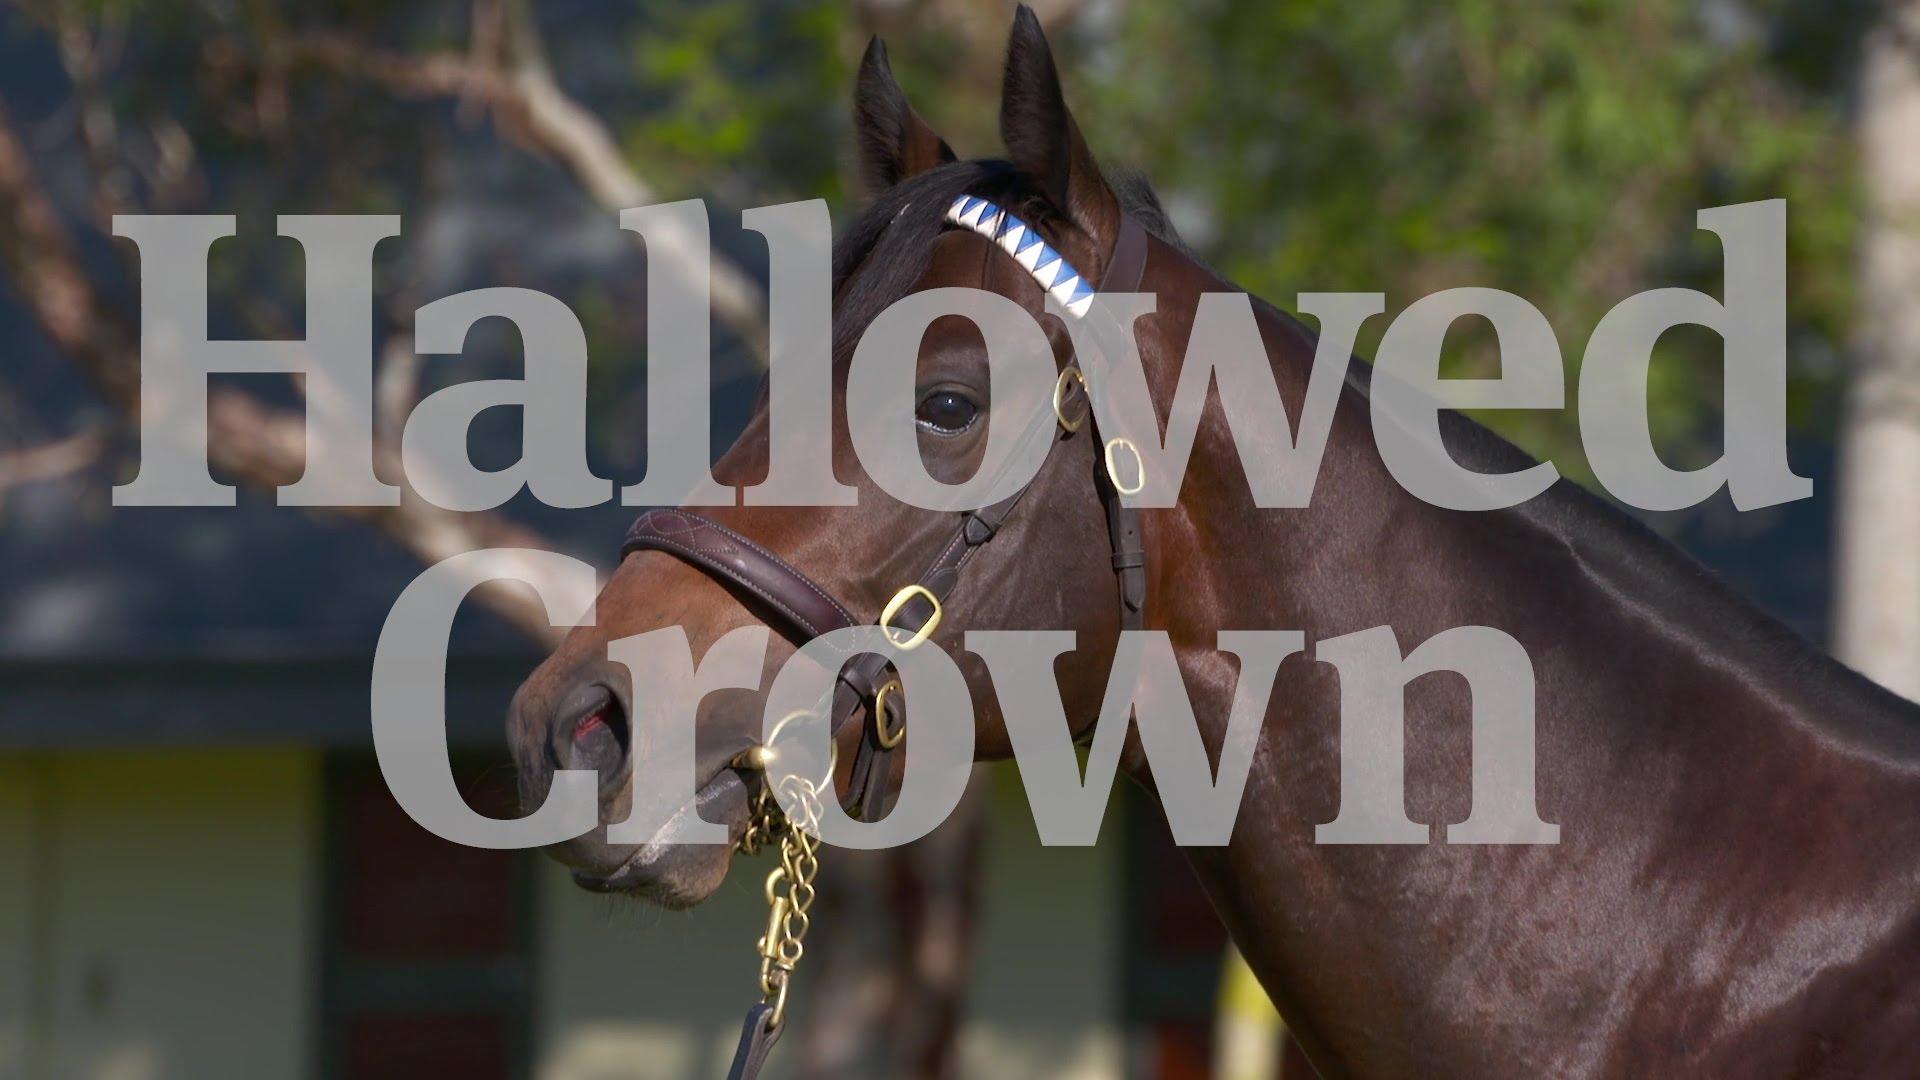 HALLOWED CROWN 4